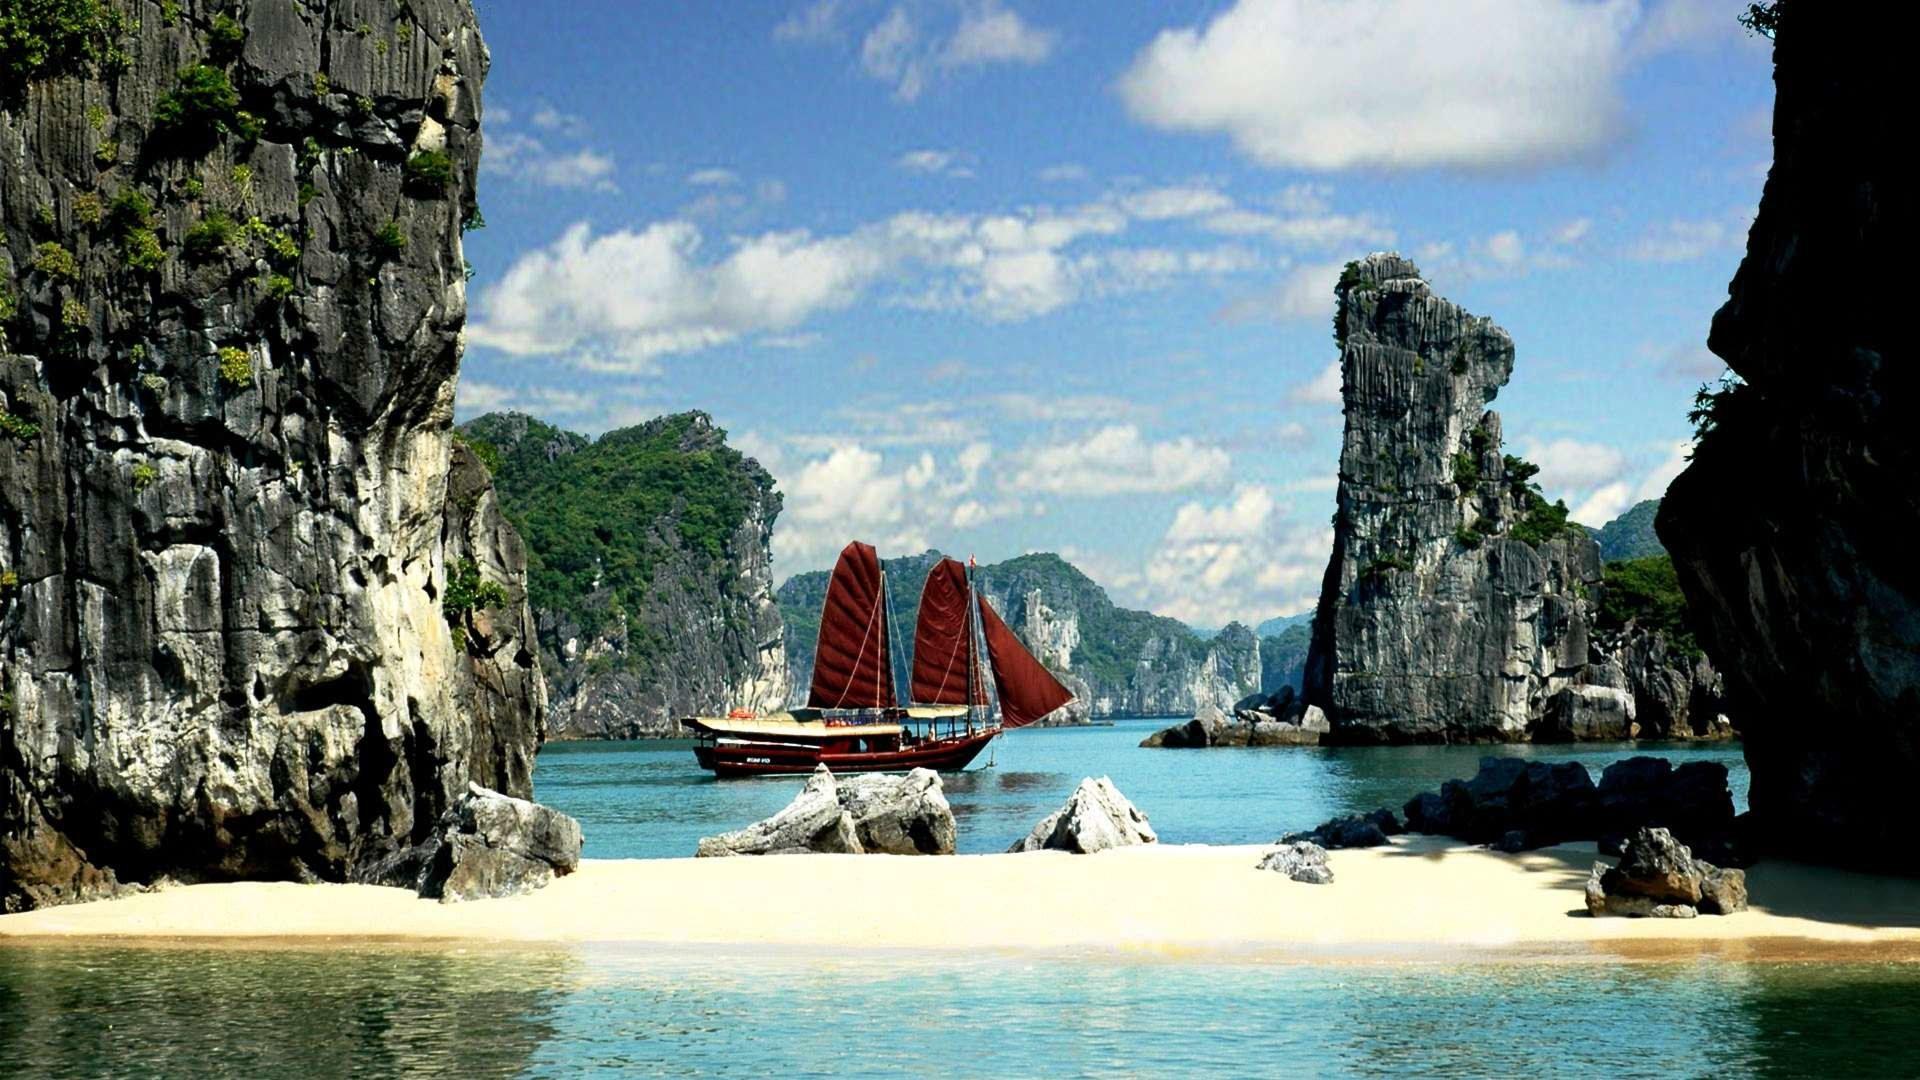 15-Day Sights of Vietnam and Cambodia - Vietnam and Cambodia Itinerary